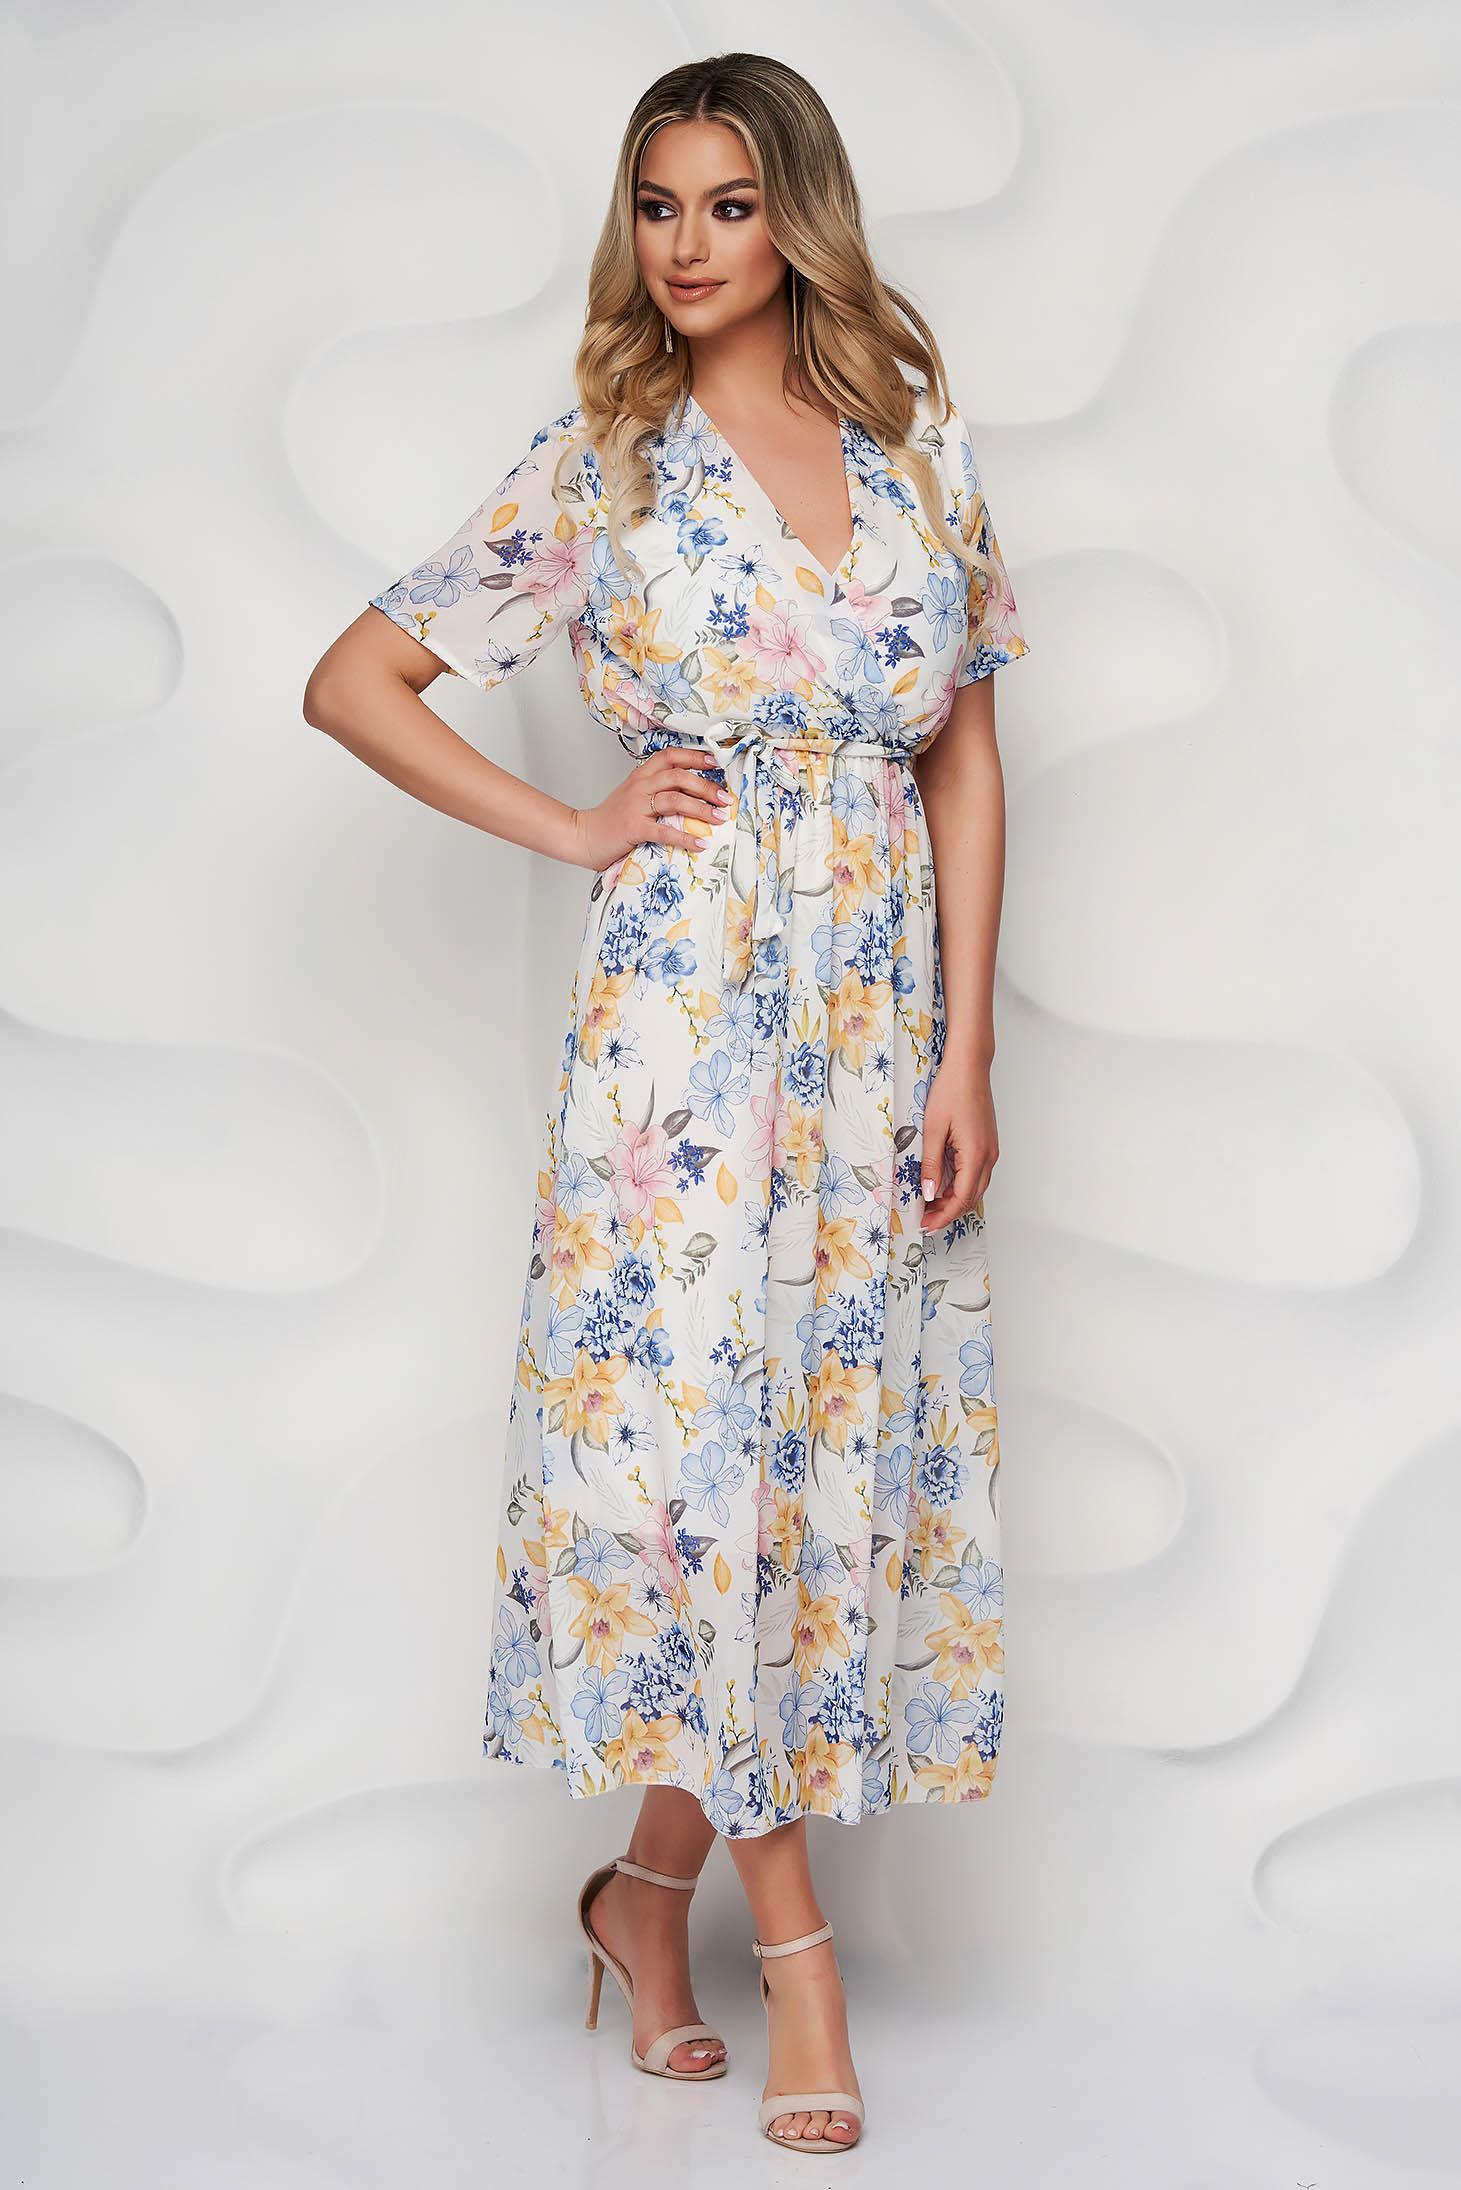 Rochie SunShine alba cu imprimeu floral in clos din material vaporos cu cordon detasabil si decolteu petrecut